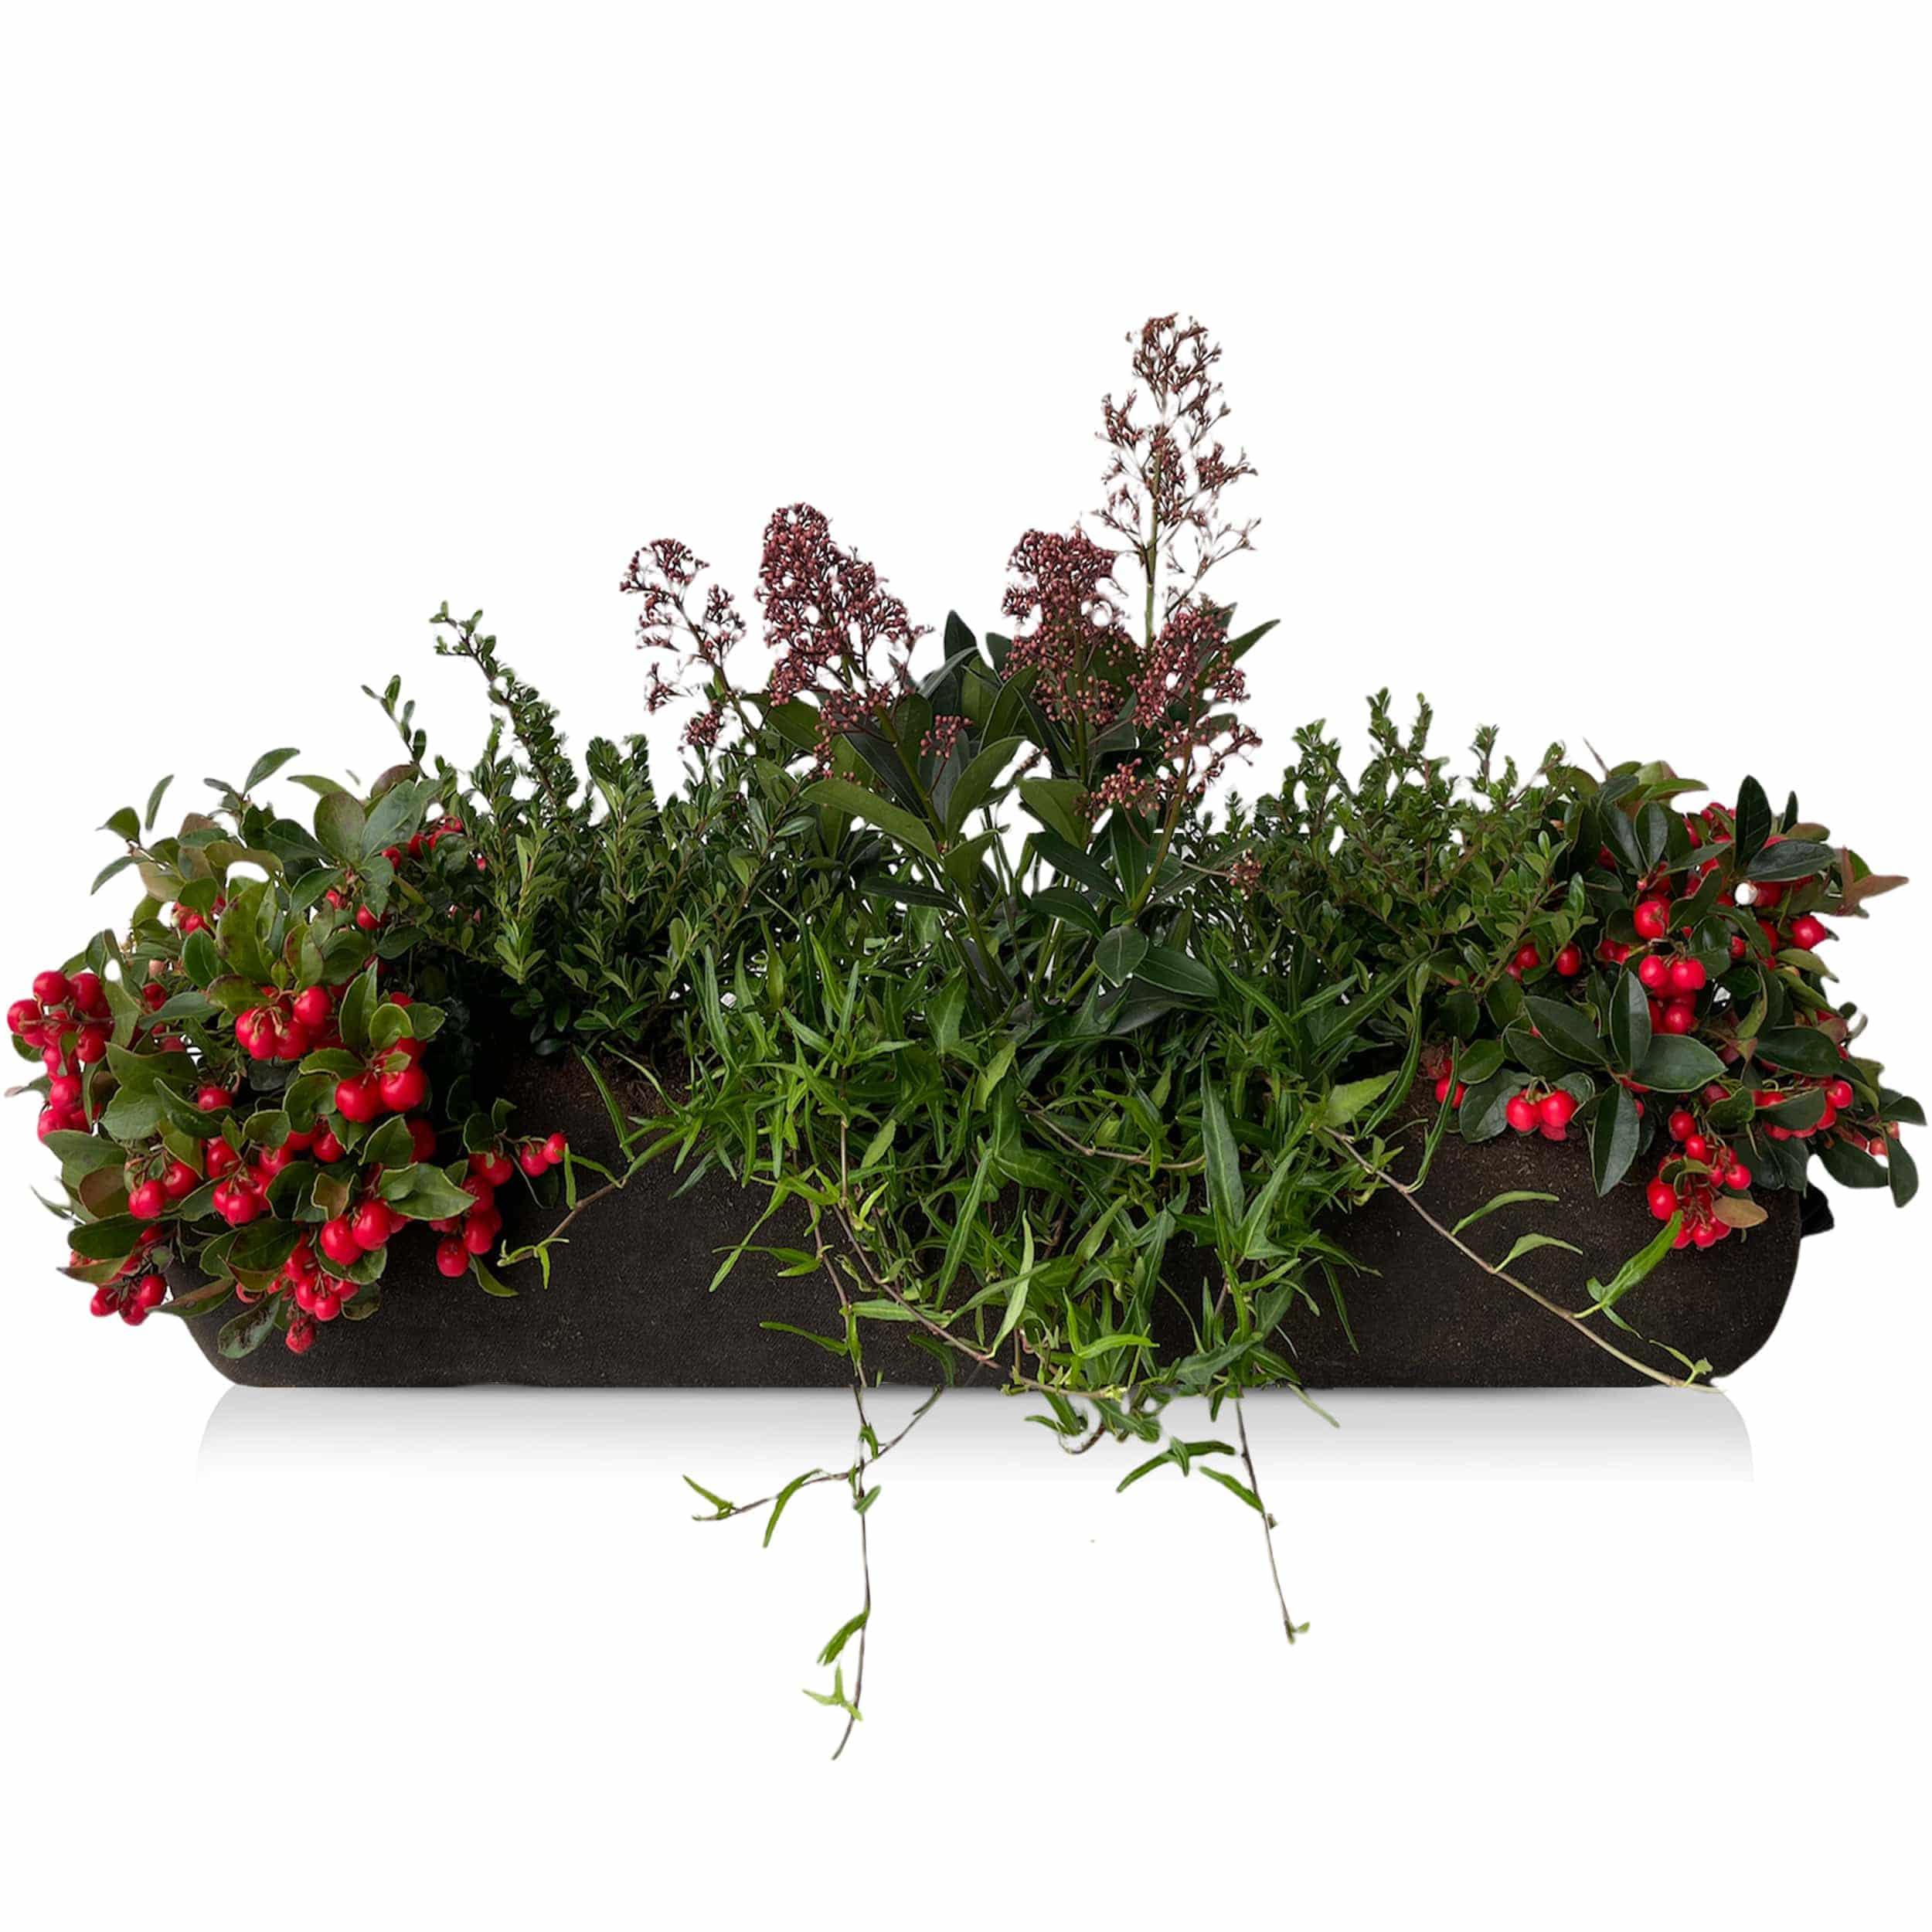 Winterblumen 'Beerenrot' Bag-Länge: 50 cm